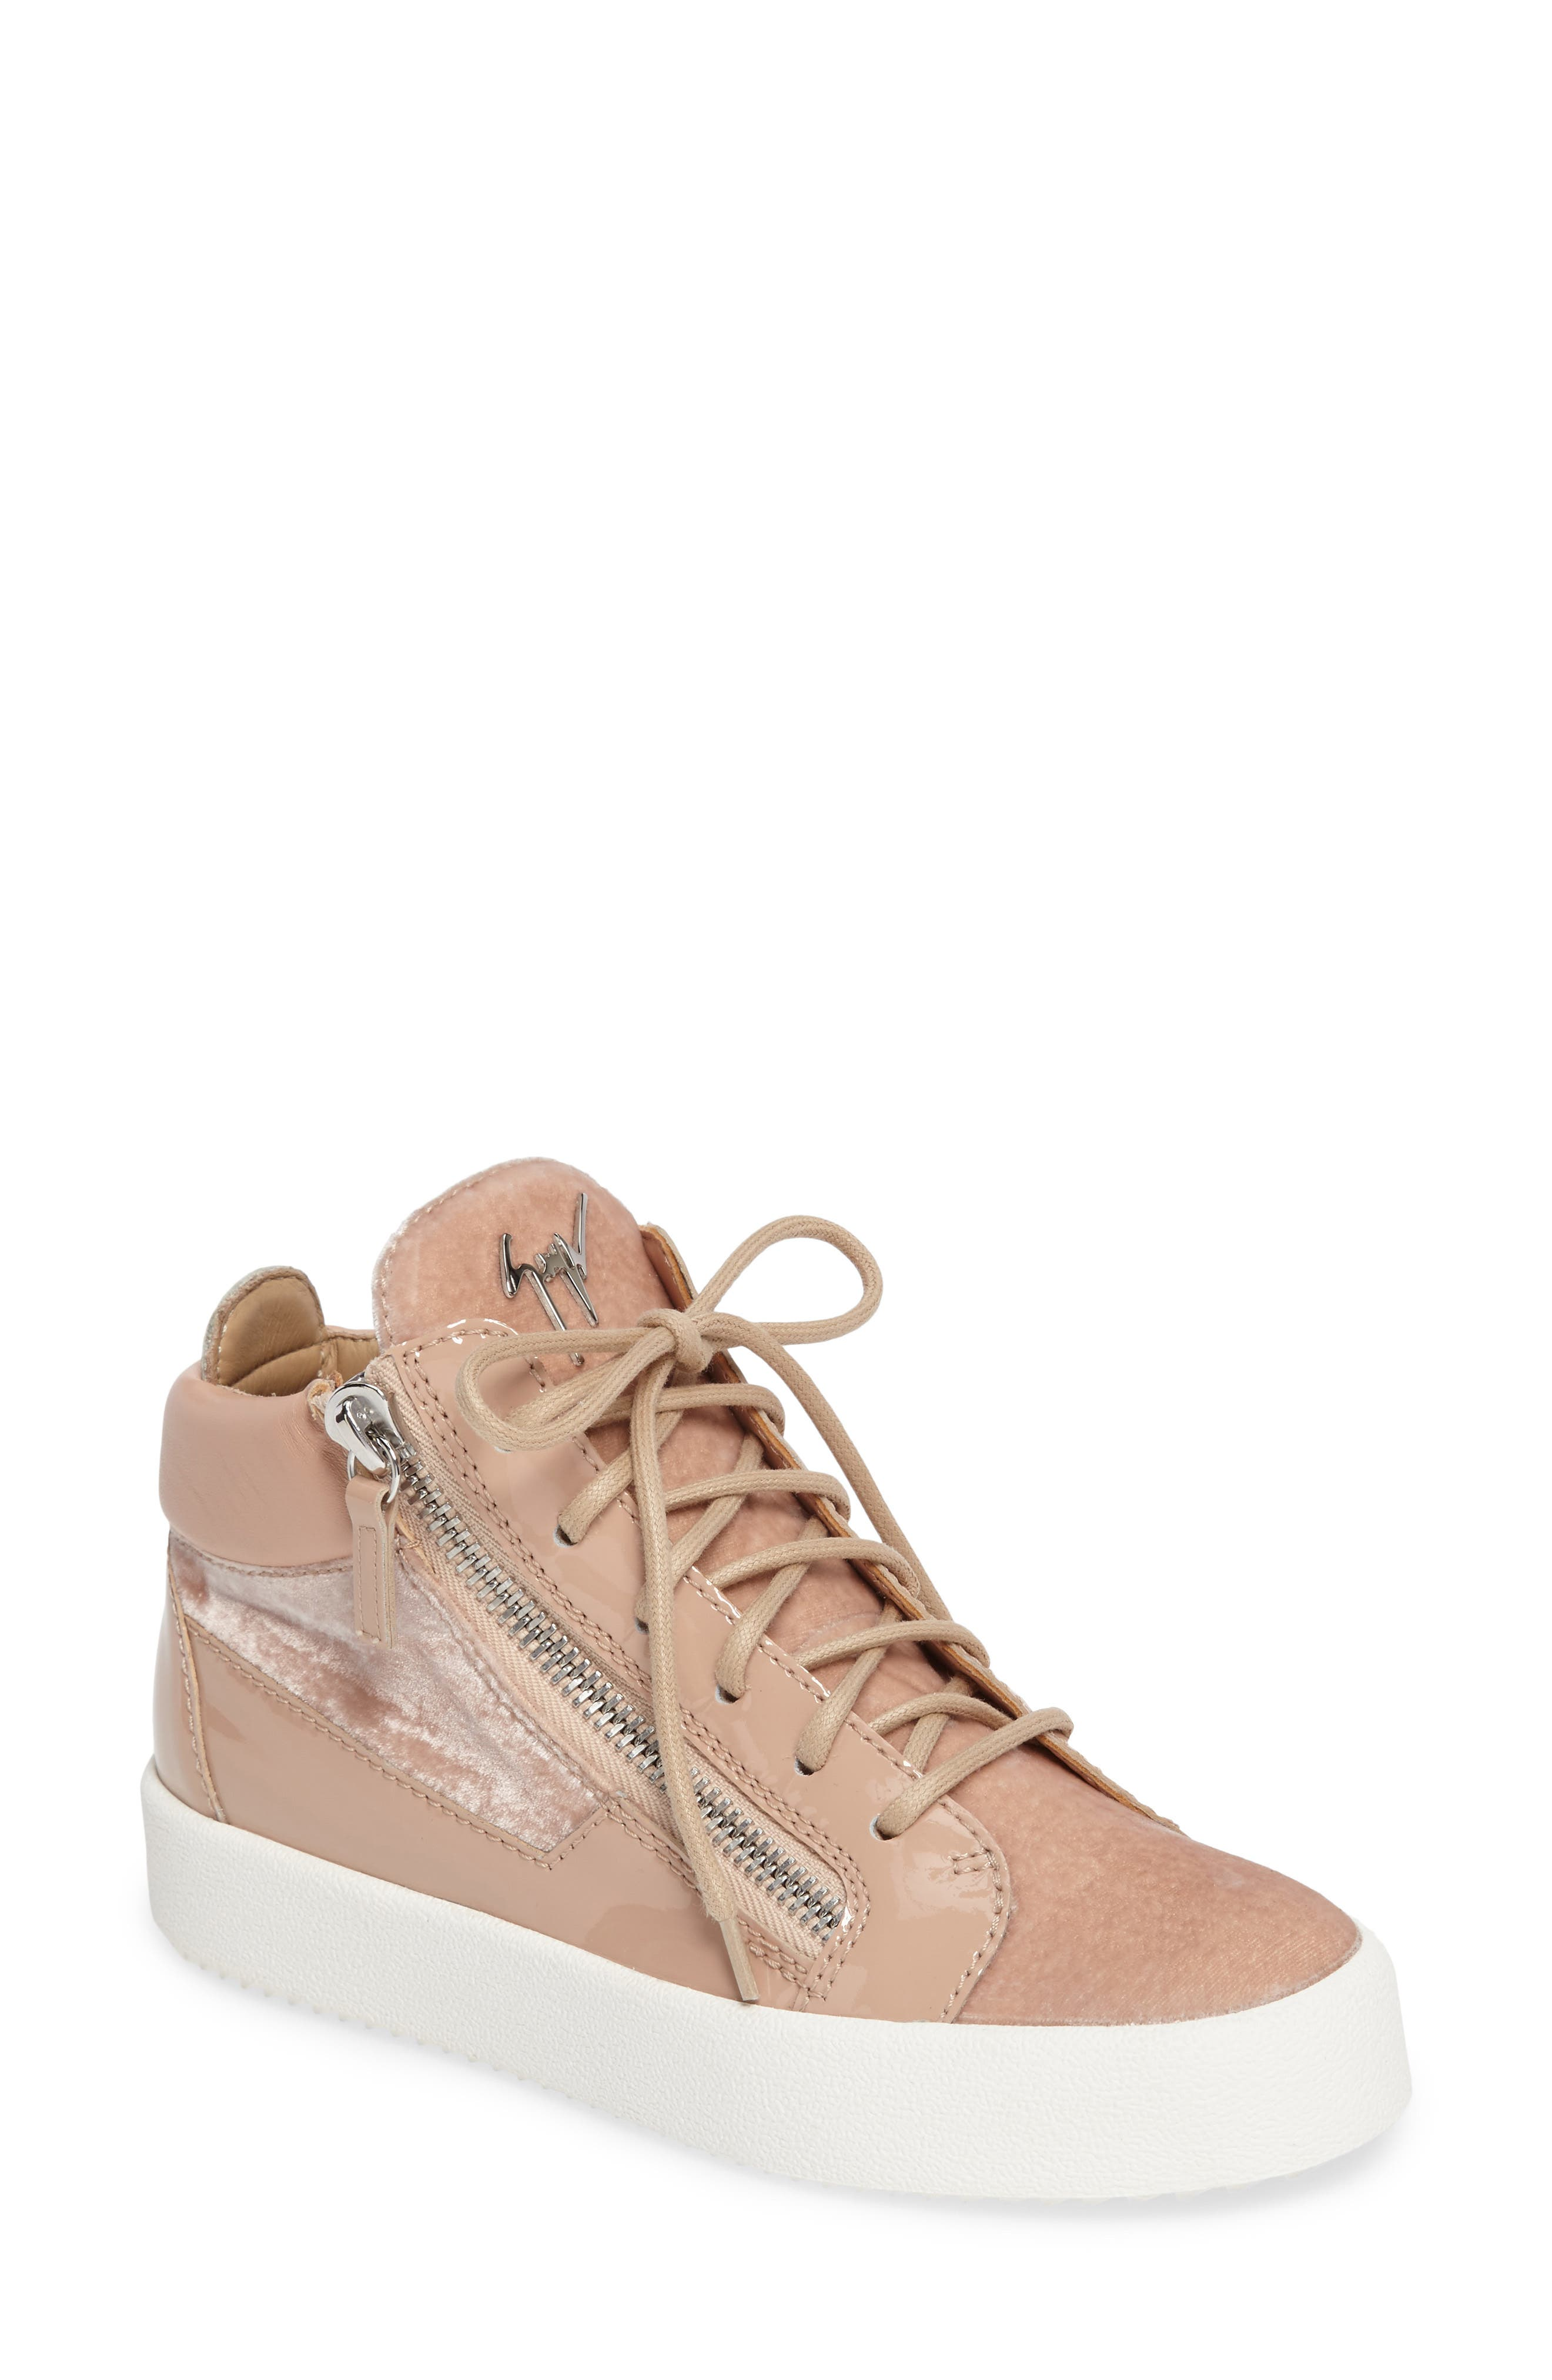 GIUSEPPE ZANOTTI Breck Mid Top Sneaker